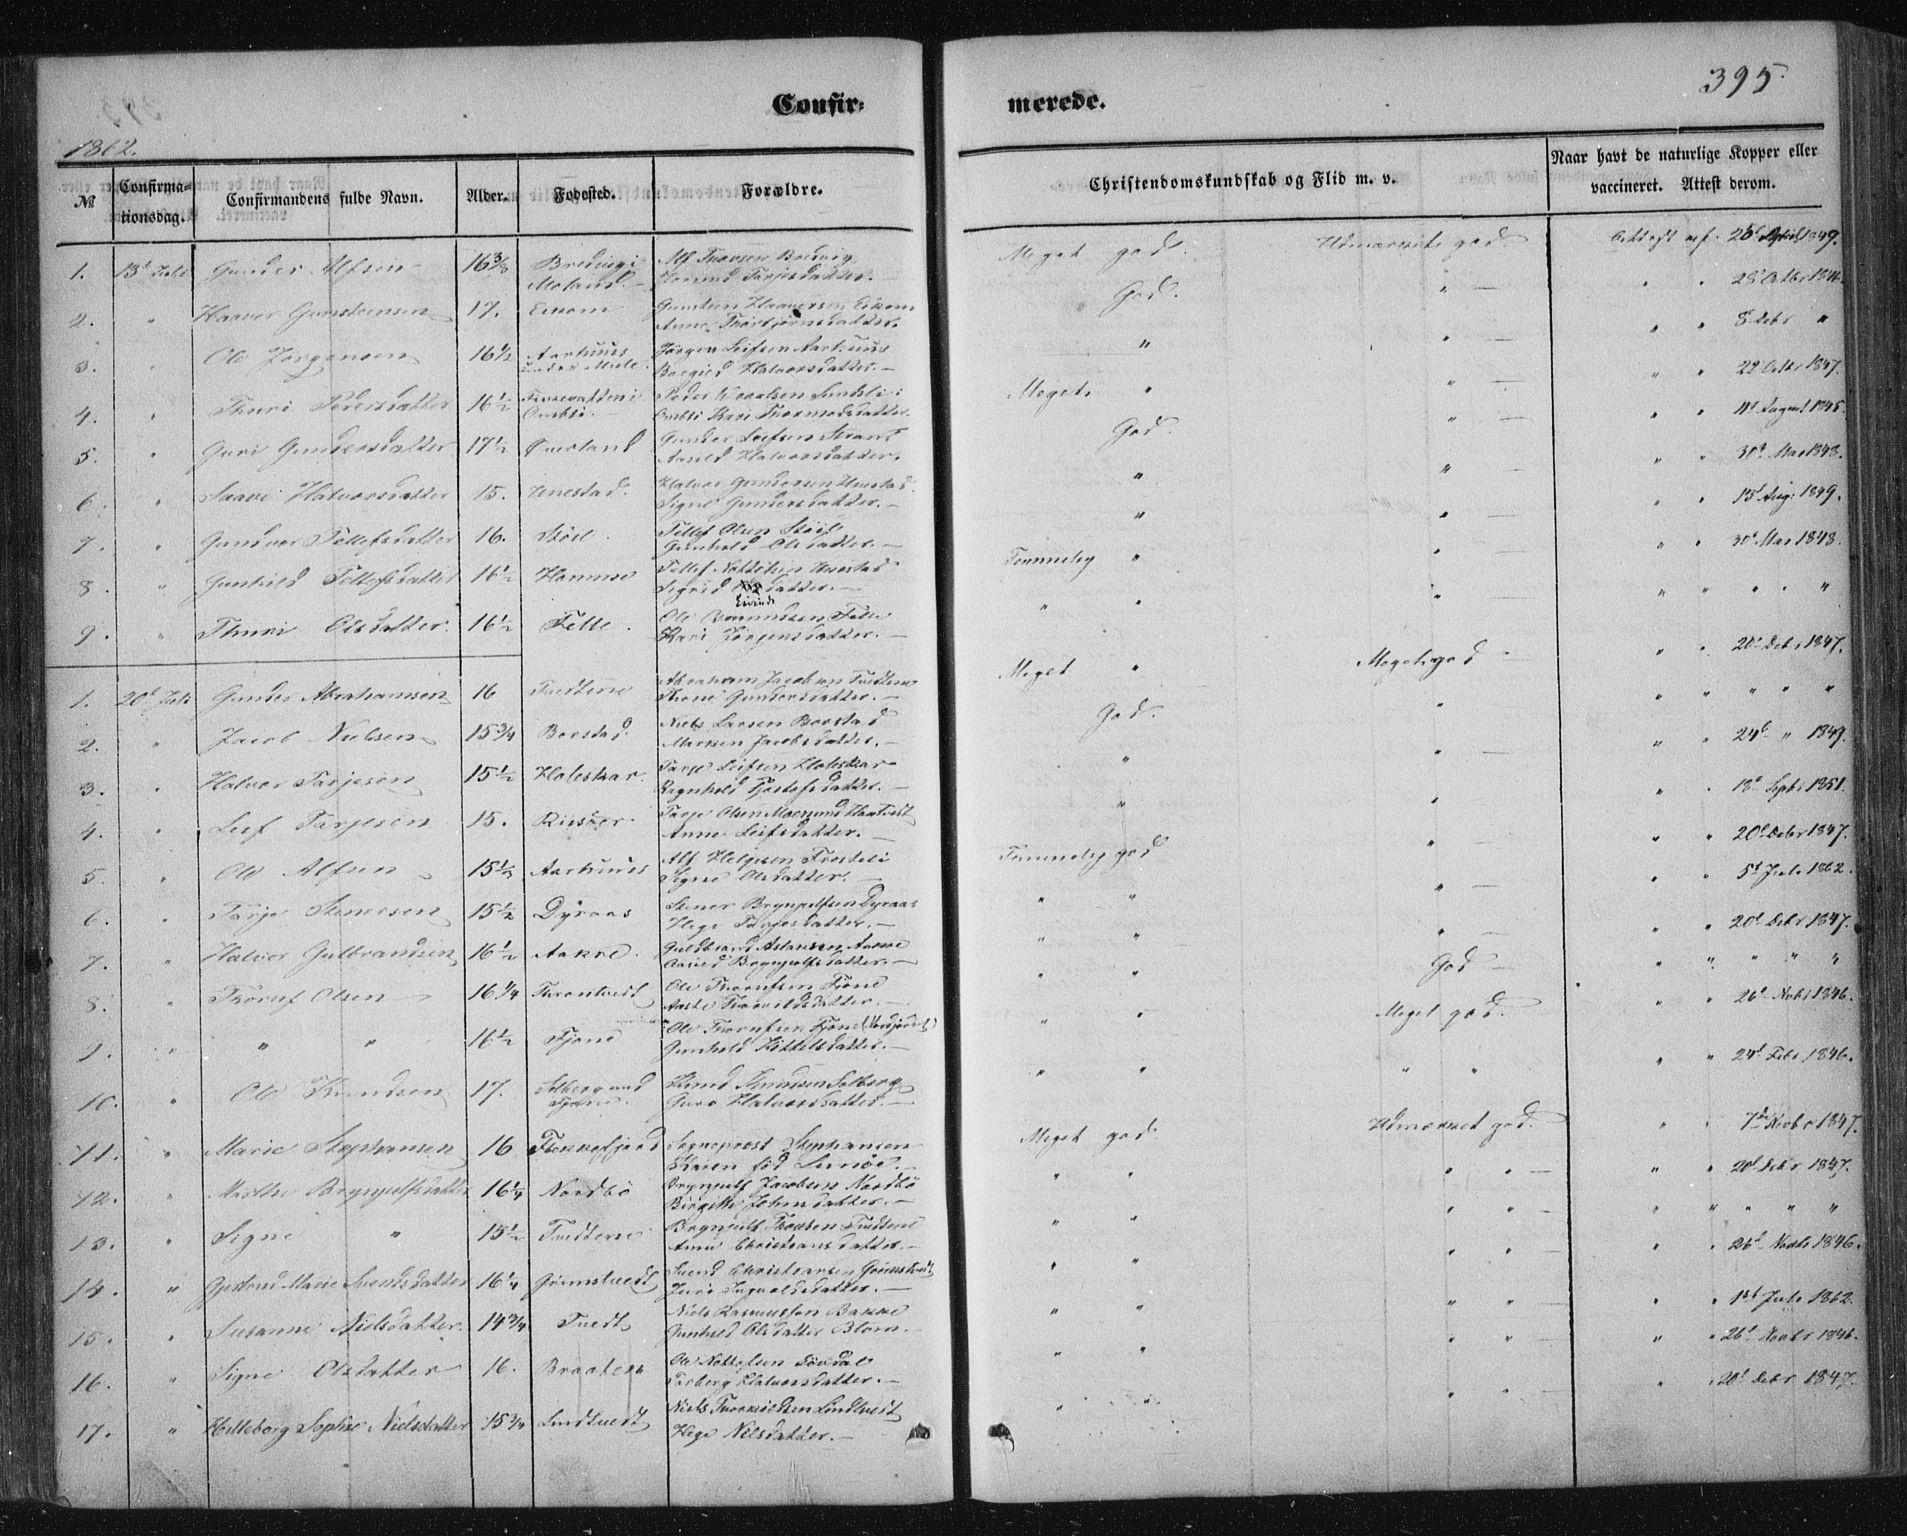 SAKO, Nissedal kirkebøker, F/Fa/L0003: Ministerialbok nr. I 3, 1846-1870, s. 394-395